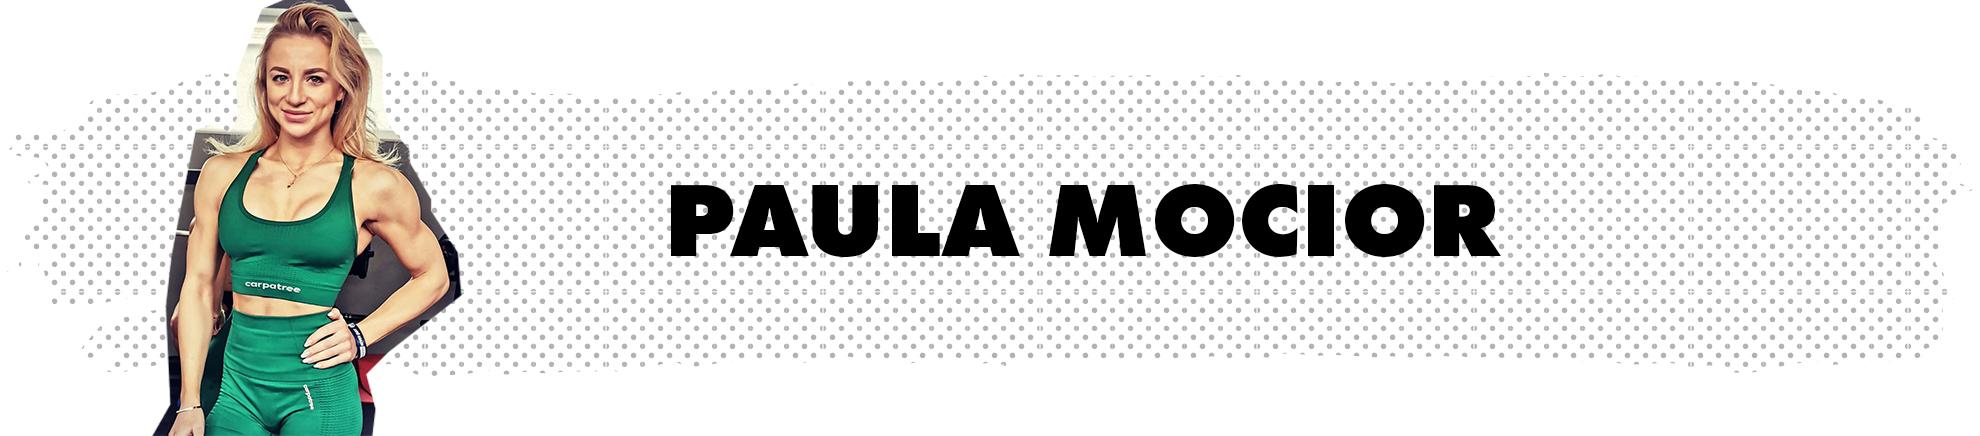 Paula Mocior - Carpatree brand ambassador